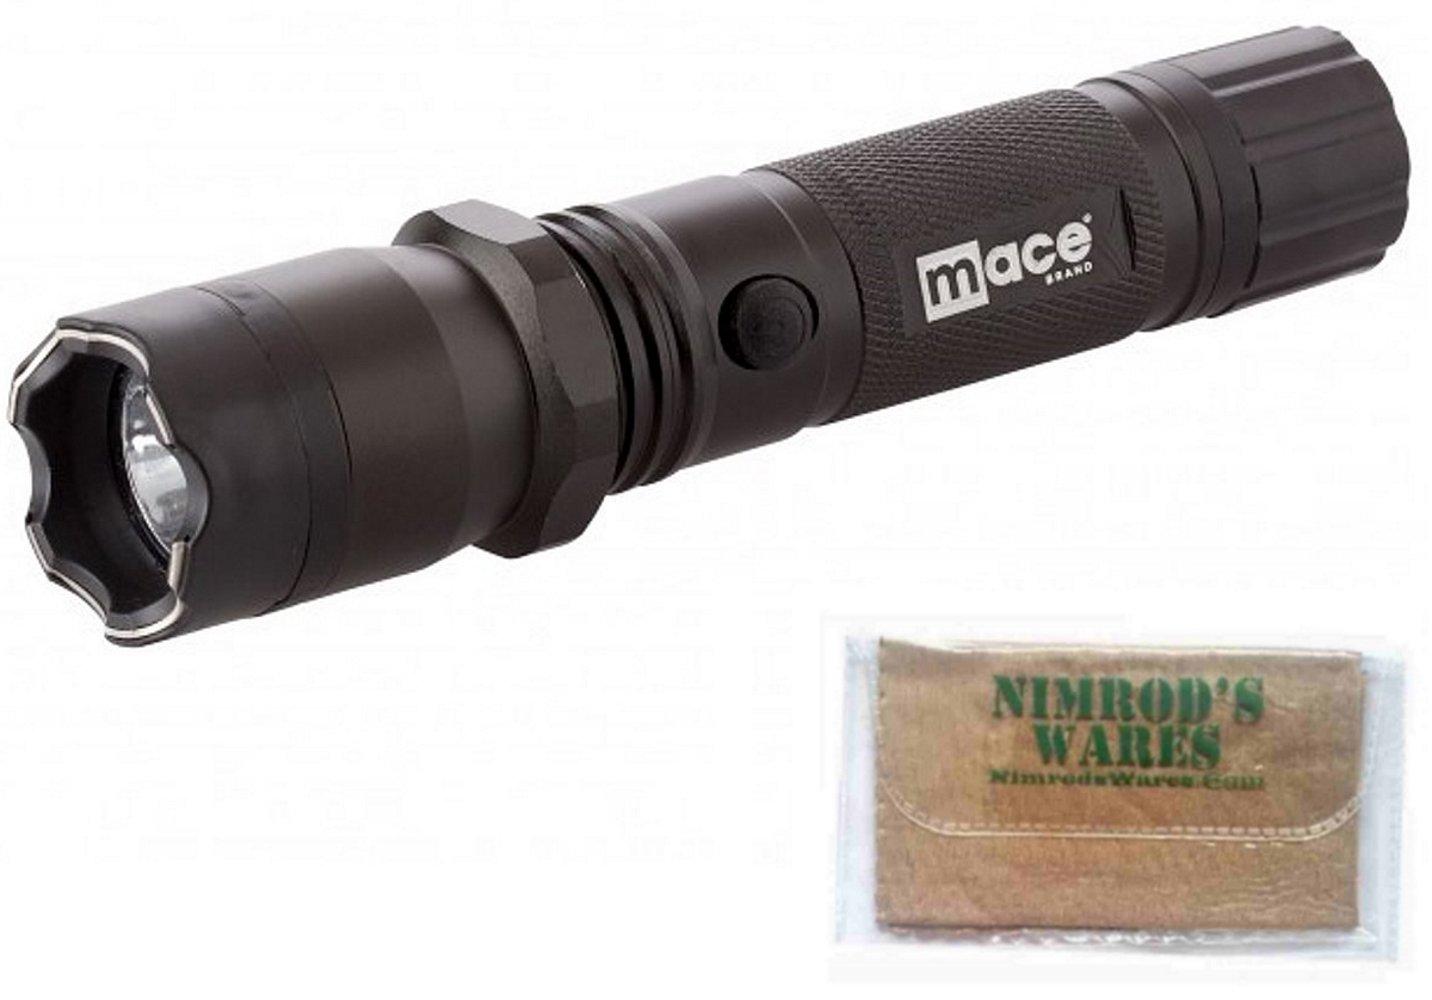 MACE Stun GUN & Flashlight 2.4 million VOLTS 300 Lumens Strobe + Nimrod's Wares Microfiber Cloth